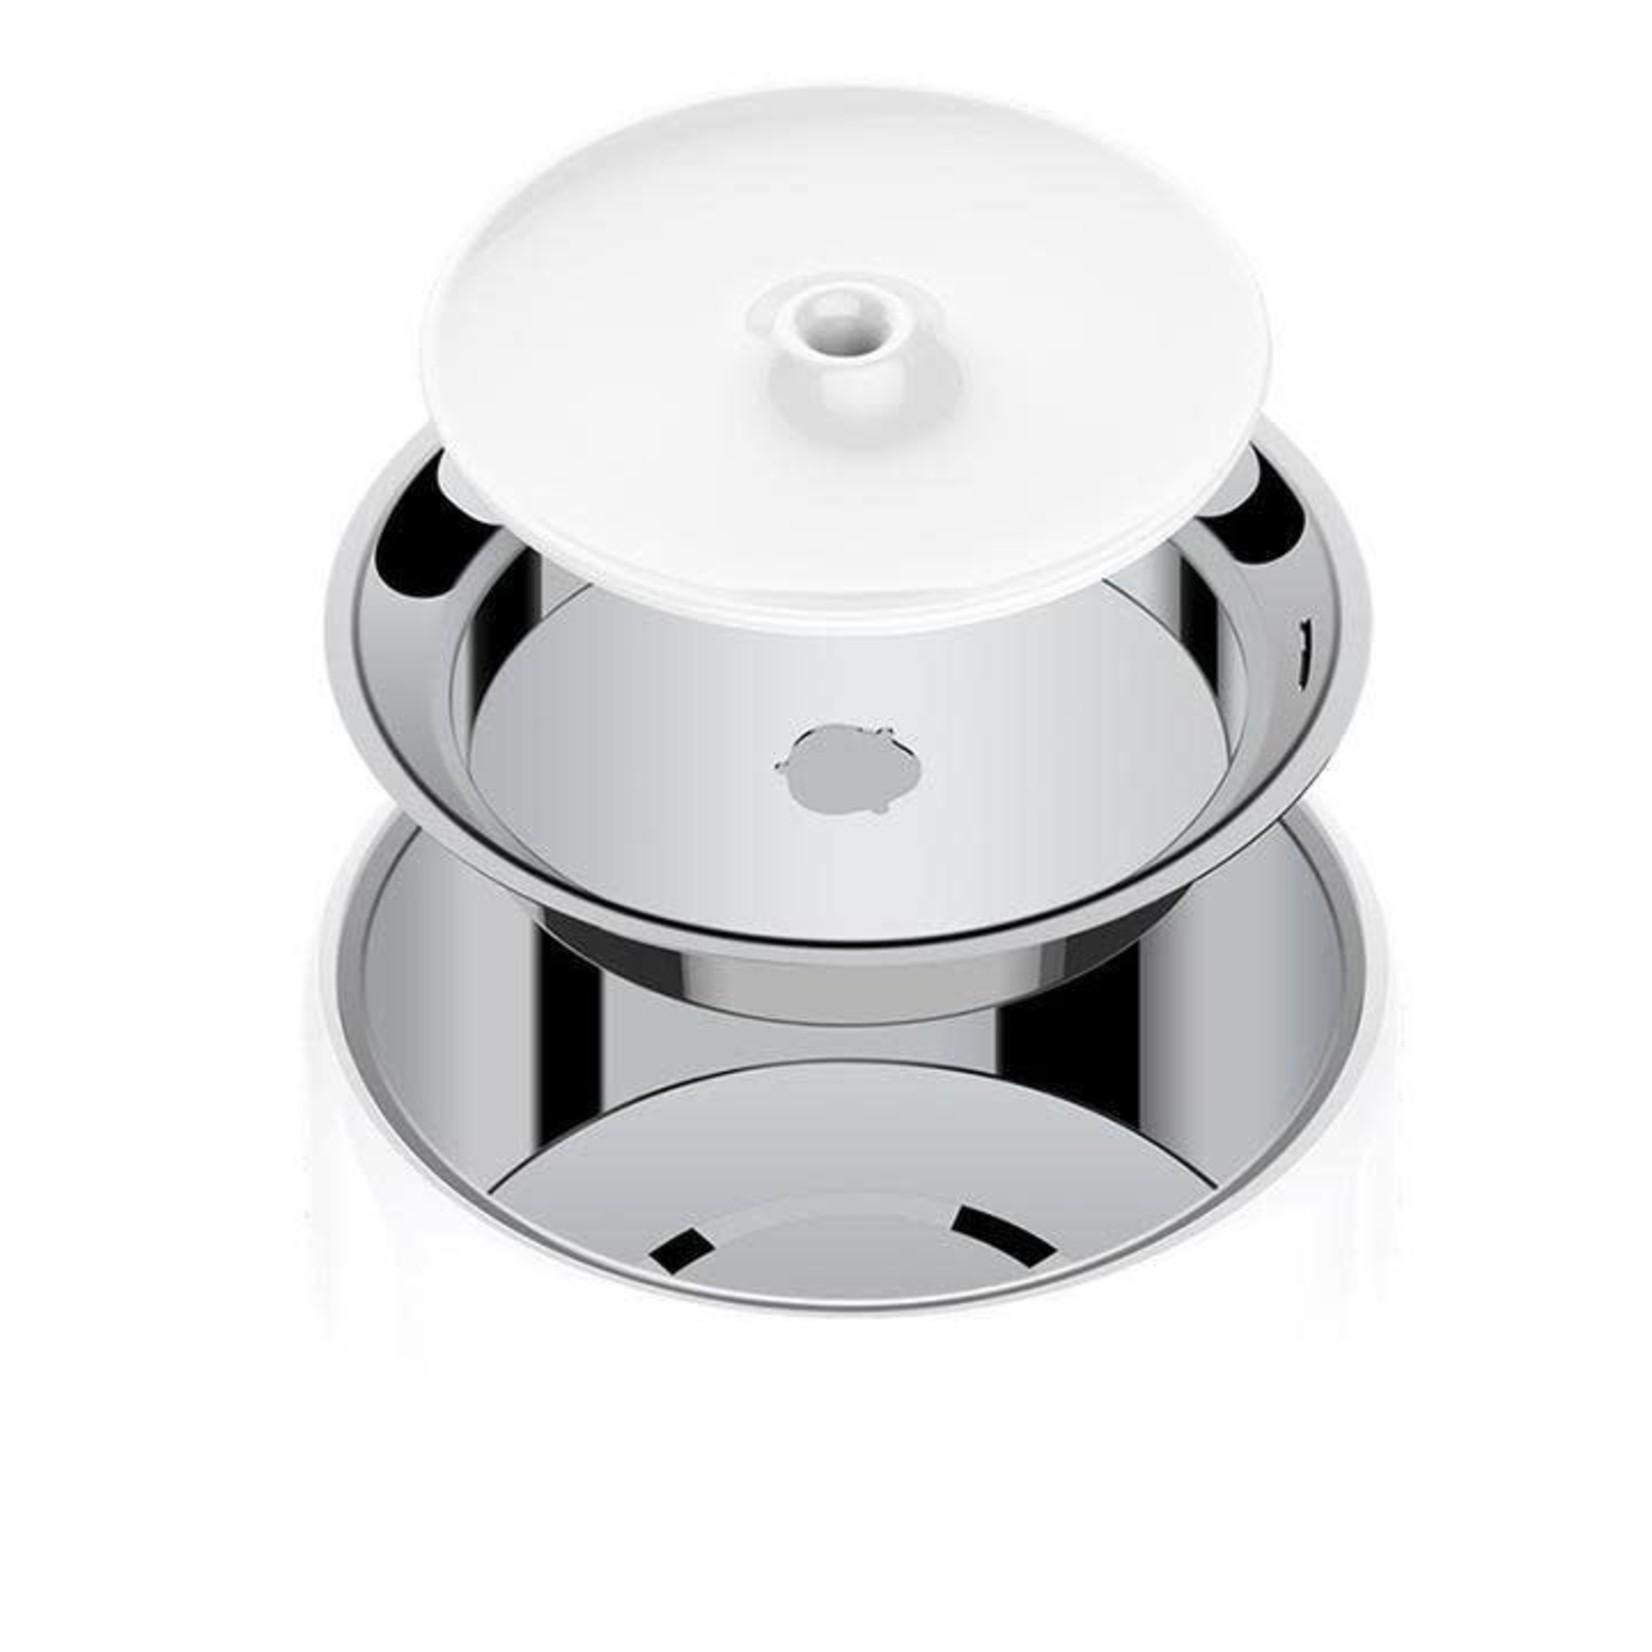 Petkit Water Fountain Filter Replacement (5 PCS)